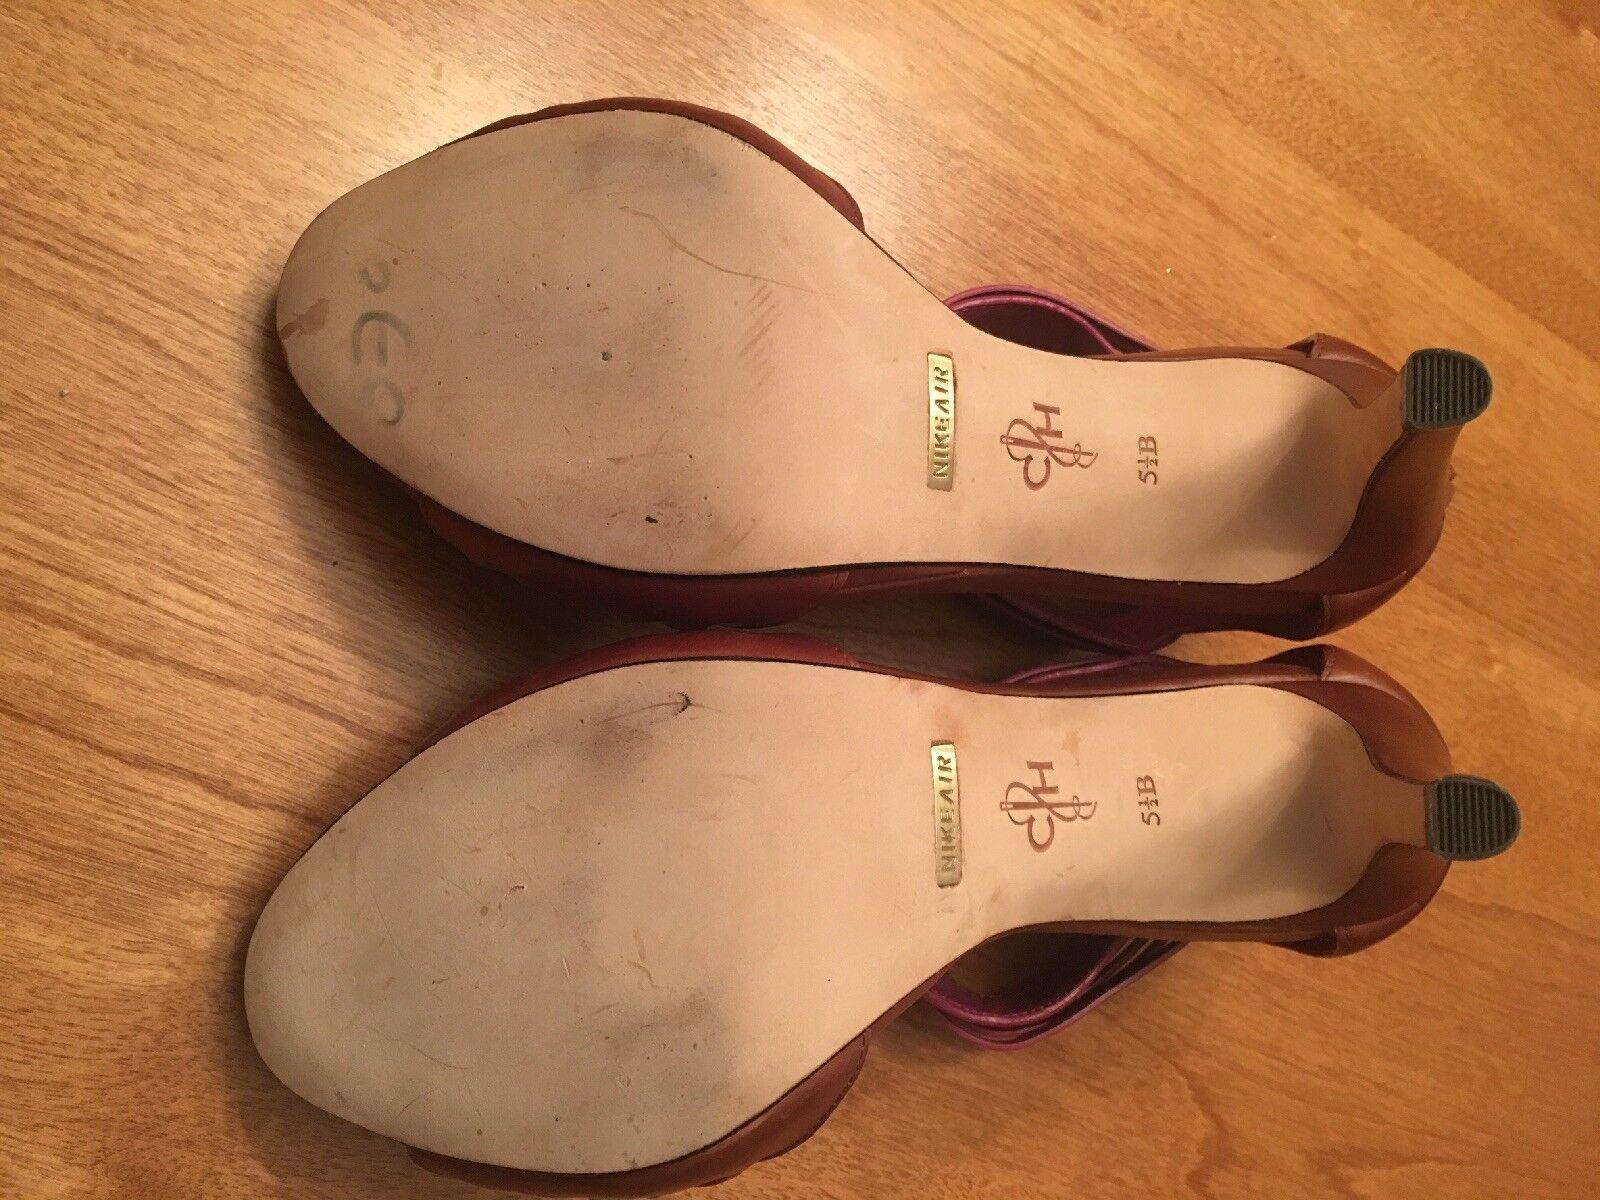 Cole Haan Vivian Vivian Vivian Air braun lila Woven Leather Heel SIze 5.5 Store Display 48cd55